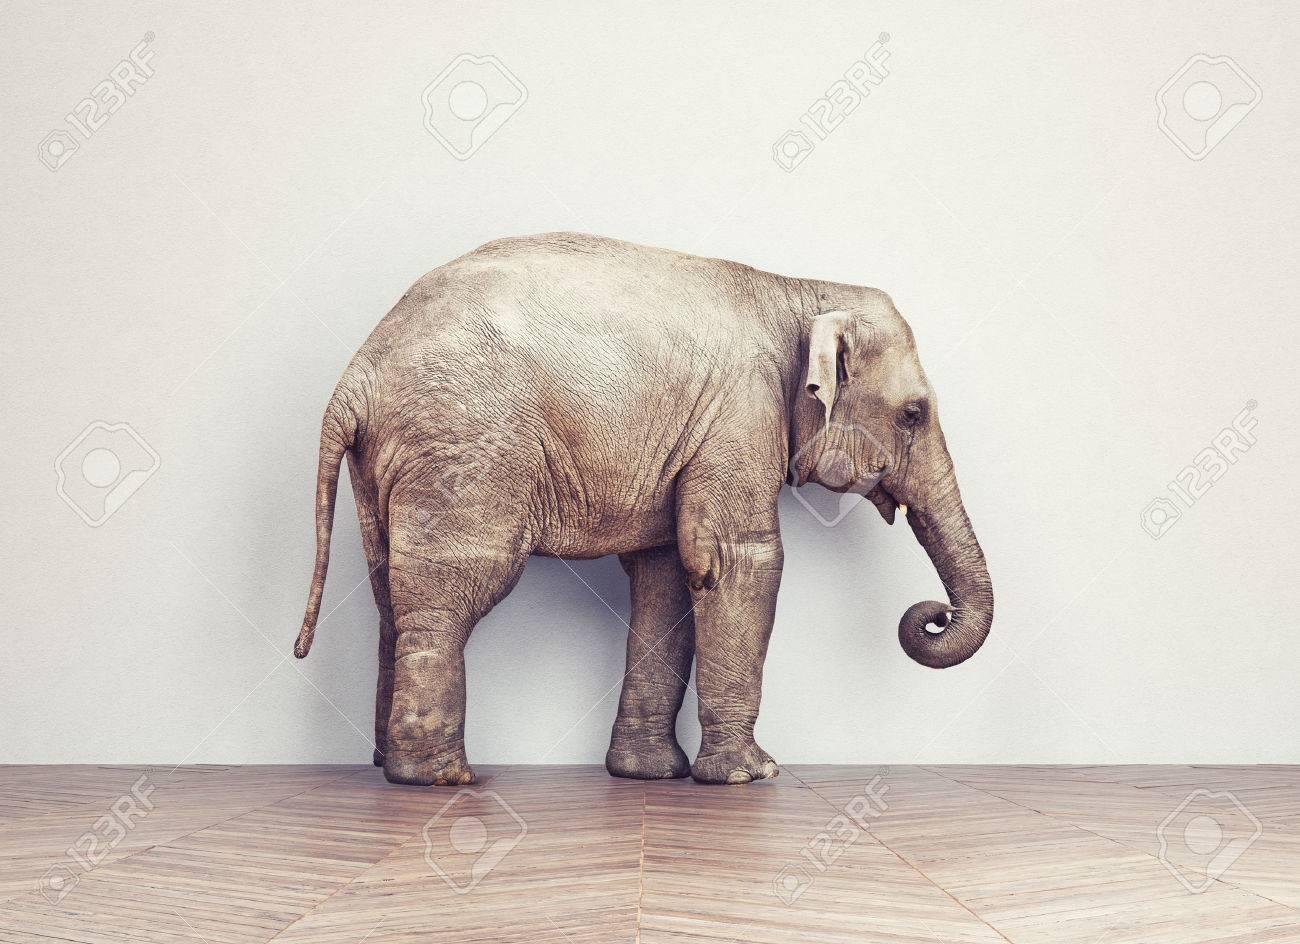 an elephant calm in the room near white wall. Creative concept Standard-Bild - 47972003